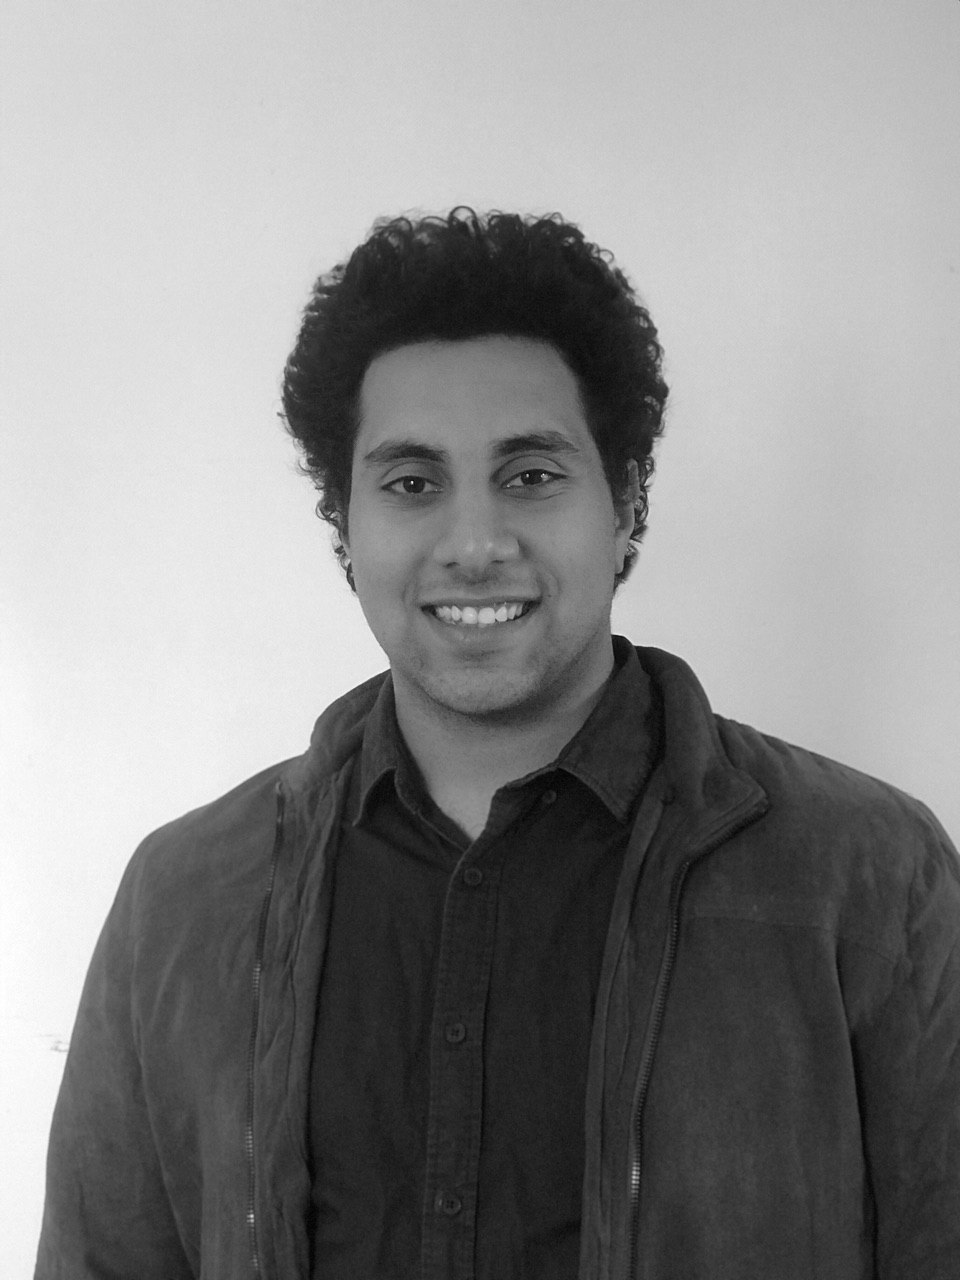 Mahmoud-ConvertImage